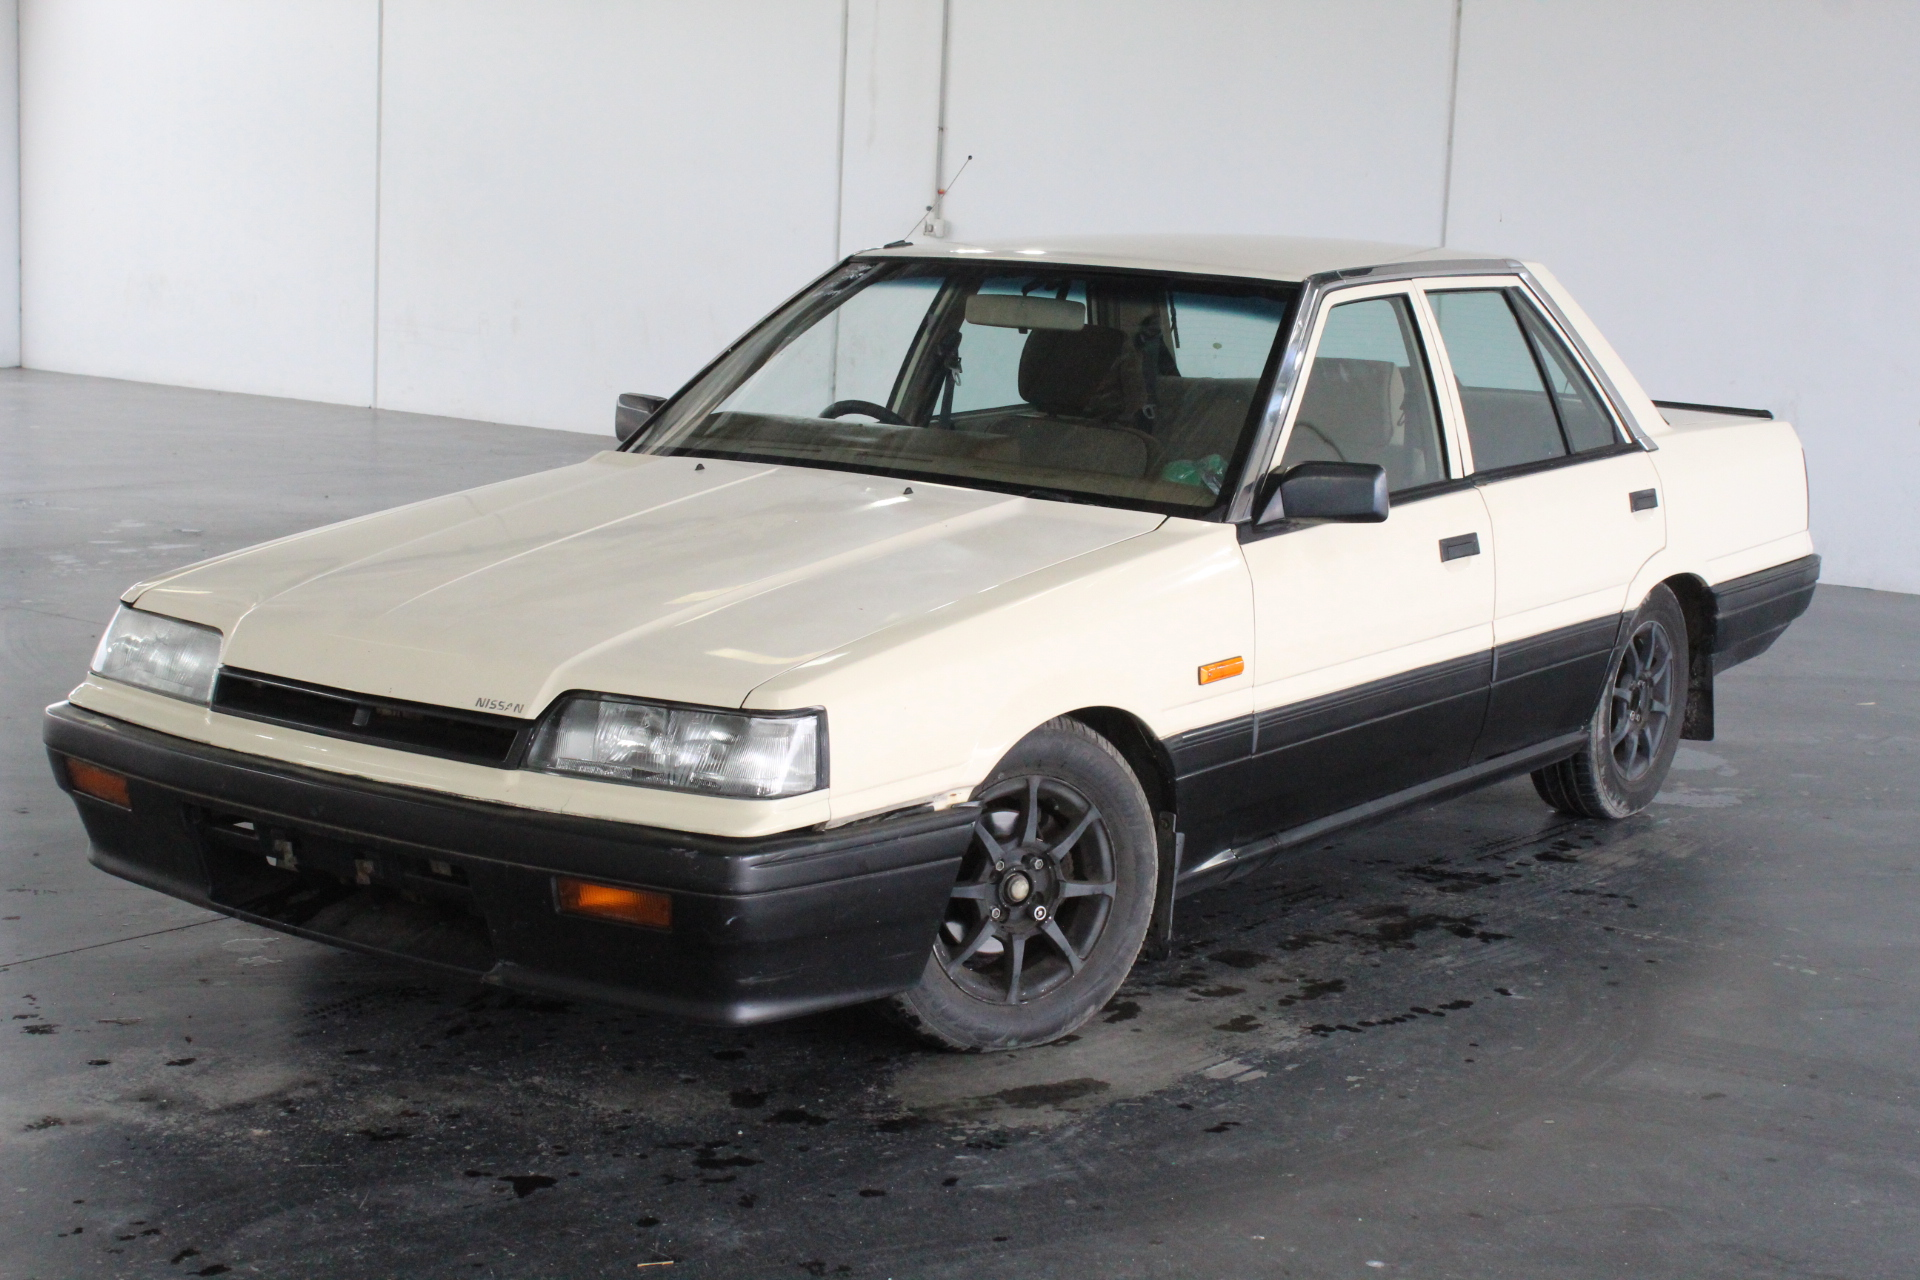 1989 Nissan Skyline Executive Automatic Sedan